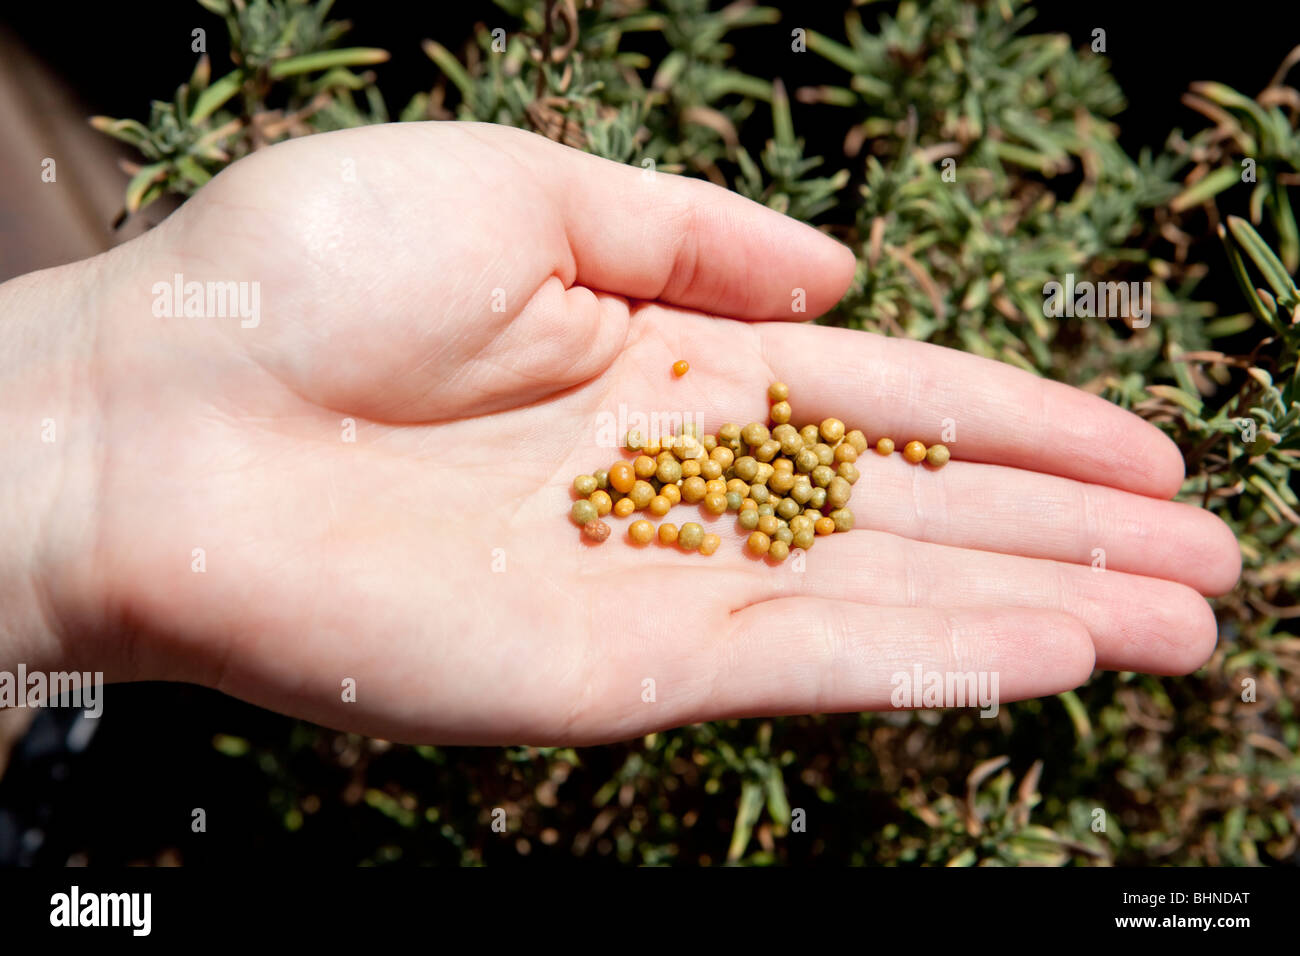 Slow release fertilizer - Stock Image